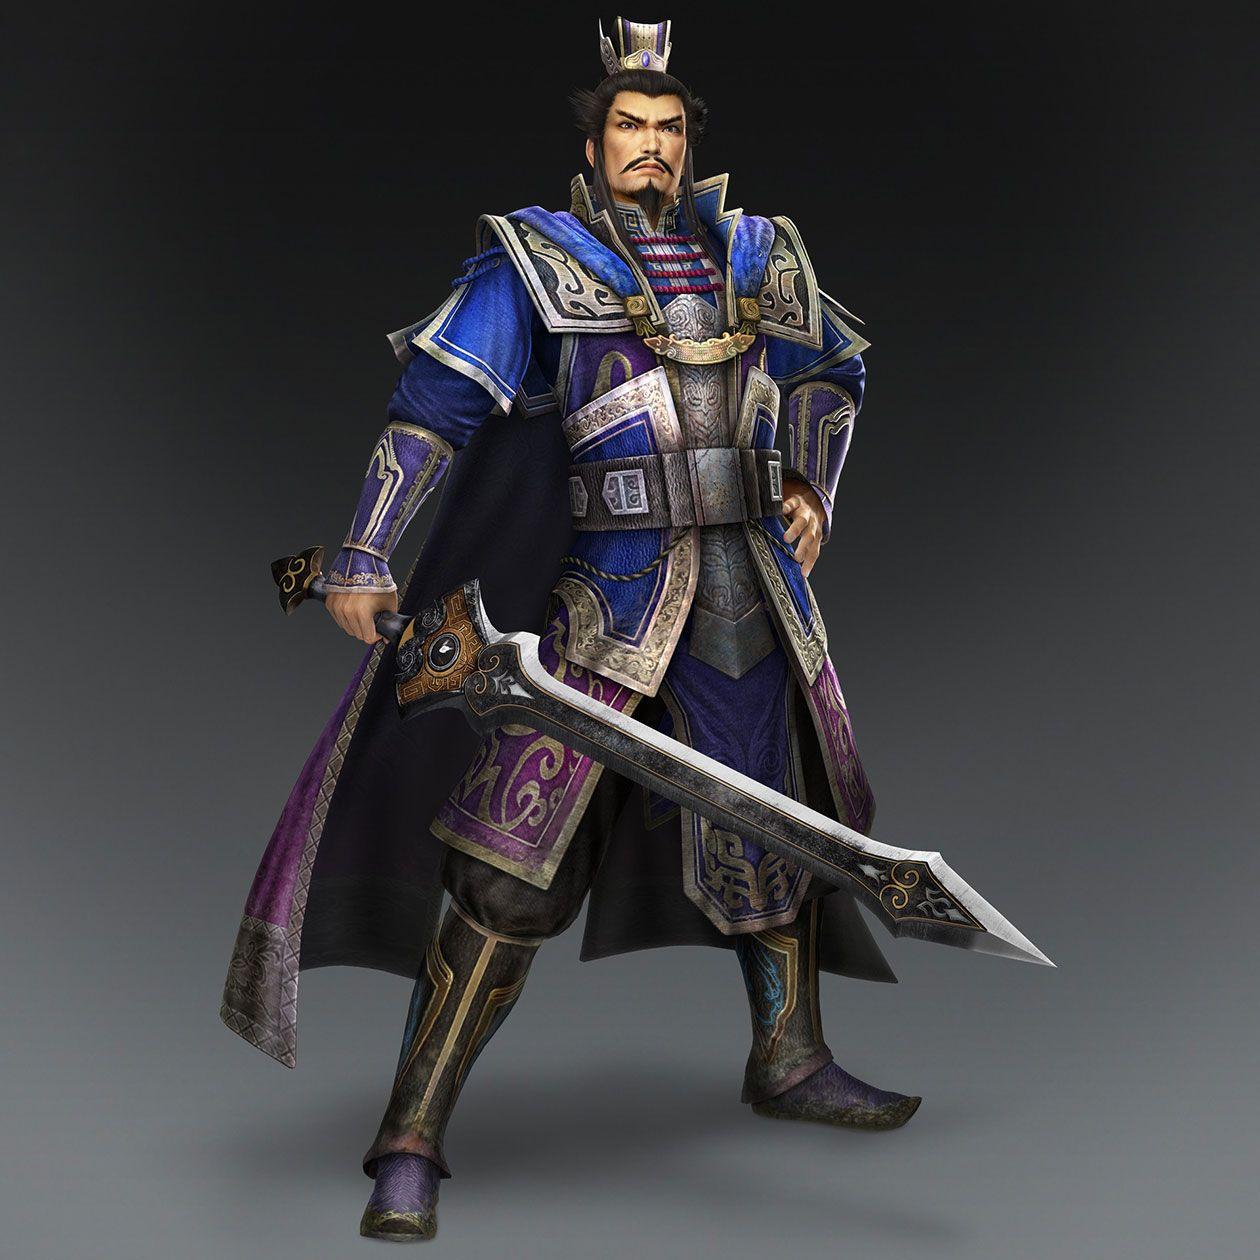 Dynasty Warriors 8 - Cao Cao 5th EX Weapon 진삼국무쌍7 조조 비장무기 ... |Cao Cao Dynasty Warriors 8